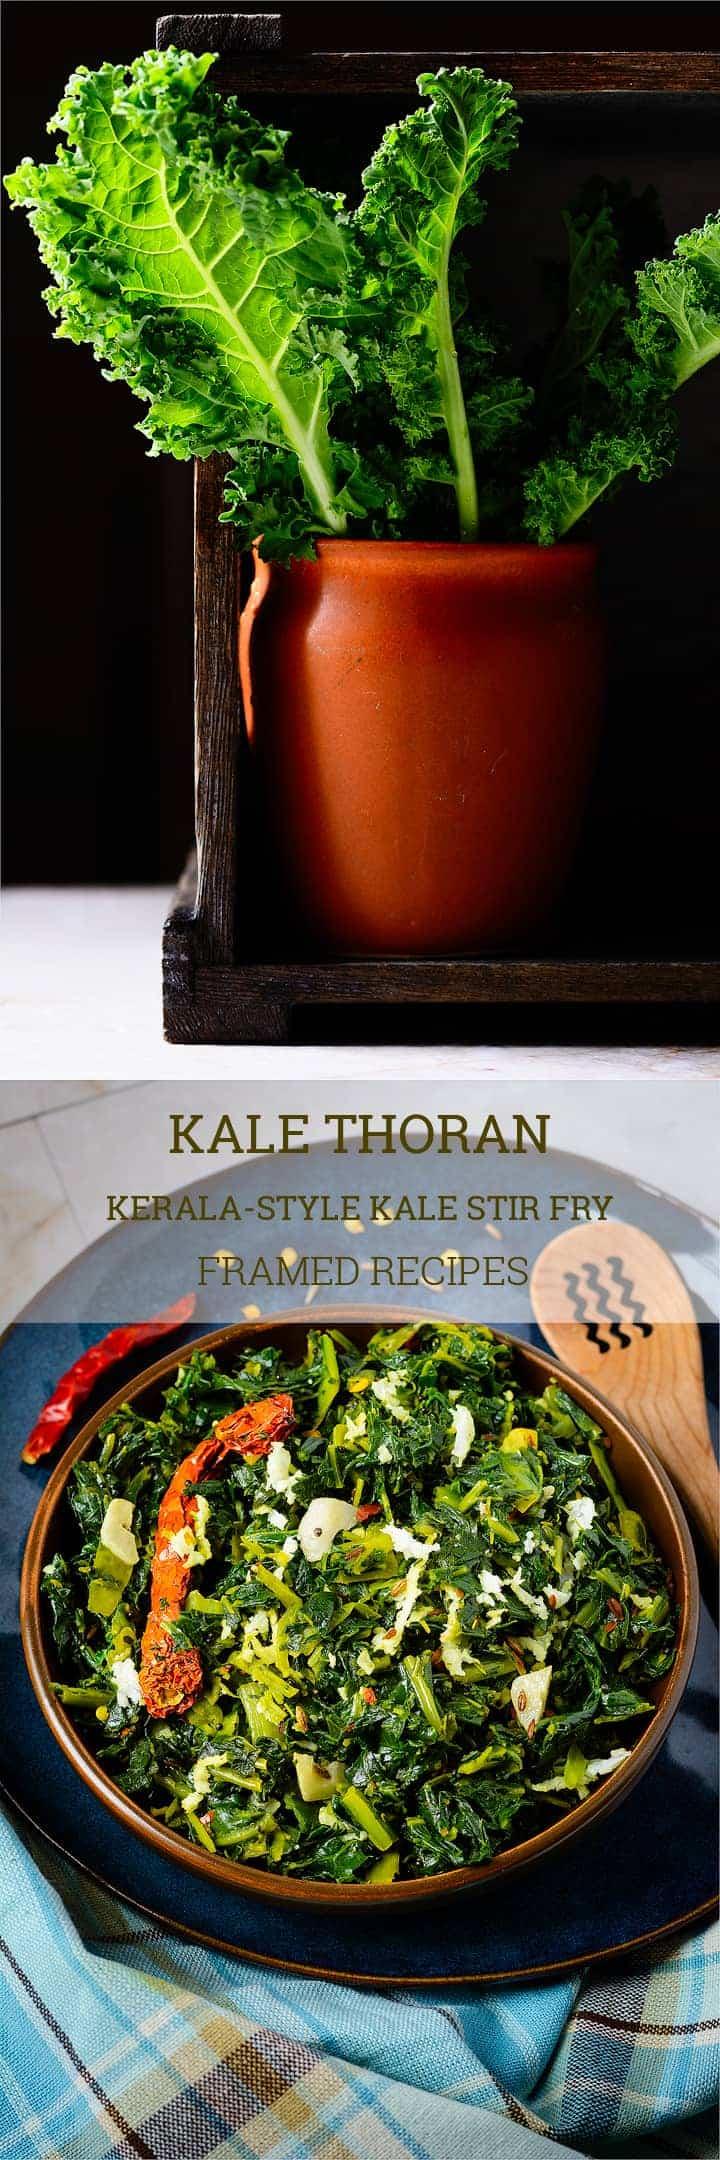 Kale thoran framed recipes kale thoran kerala style kale stir fry forumfinder Gallery